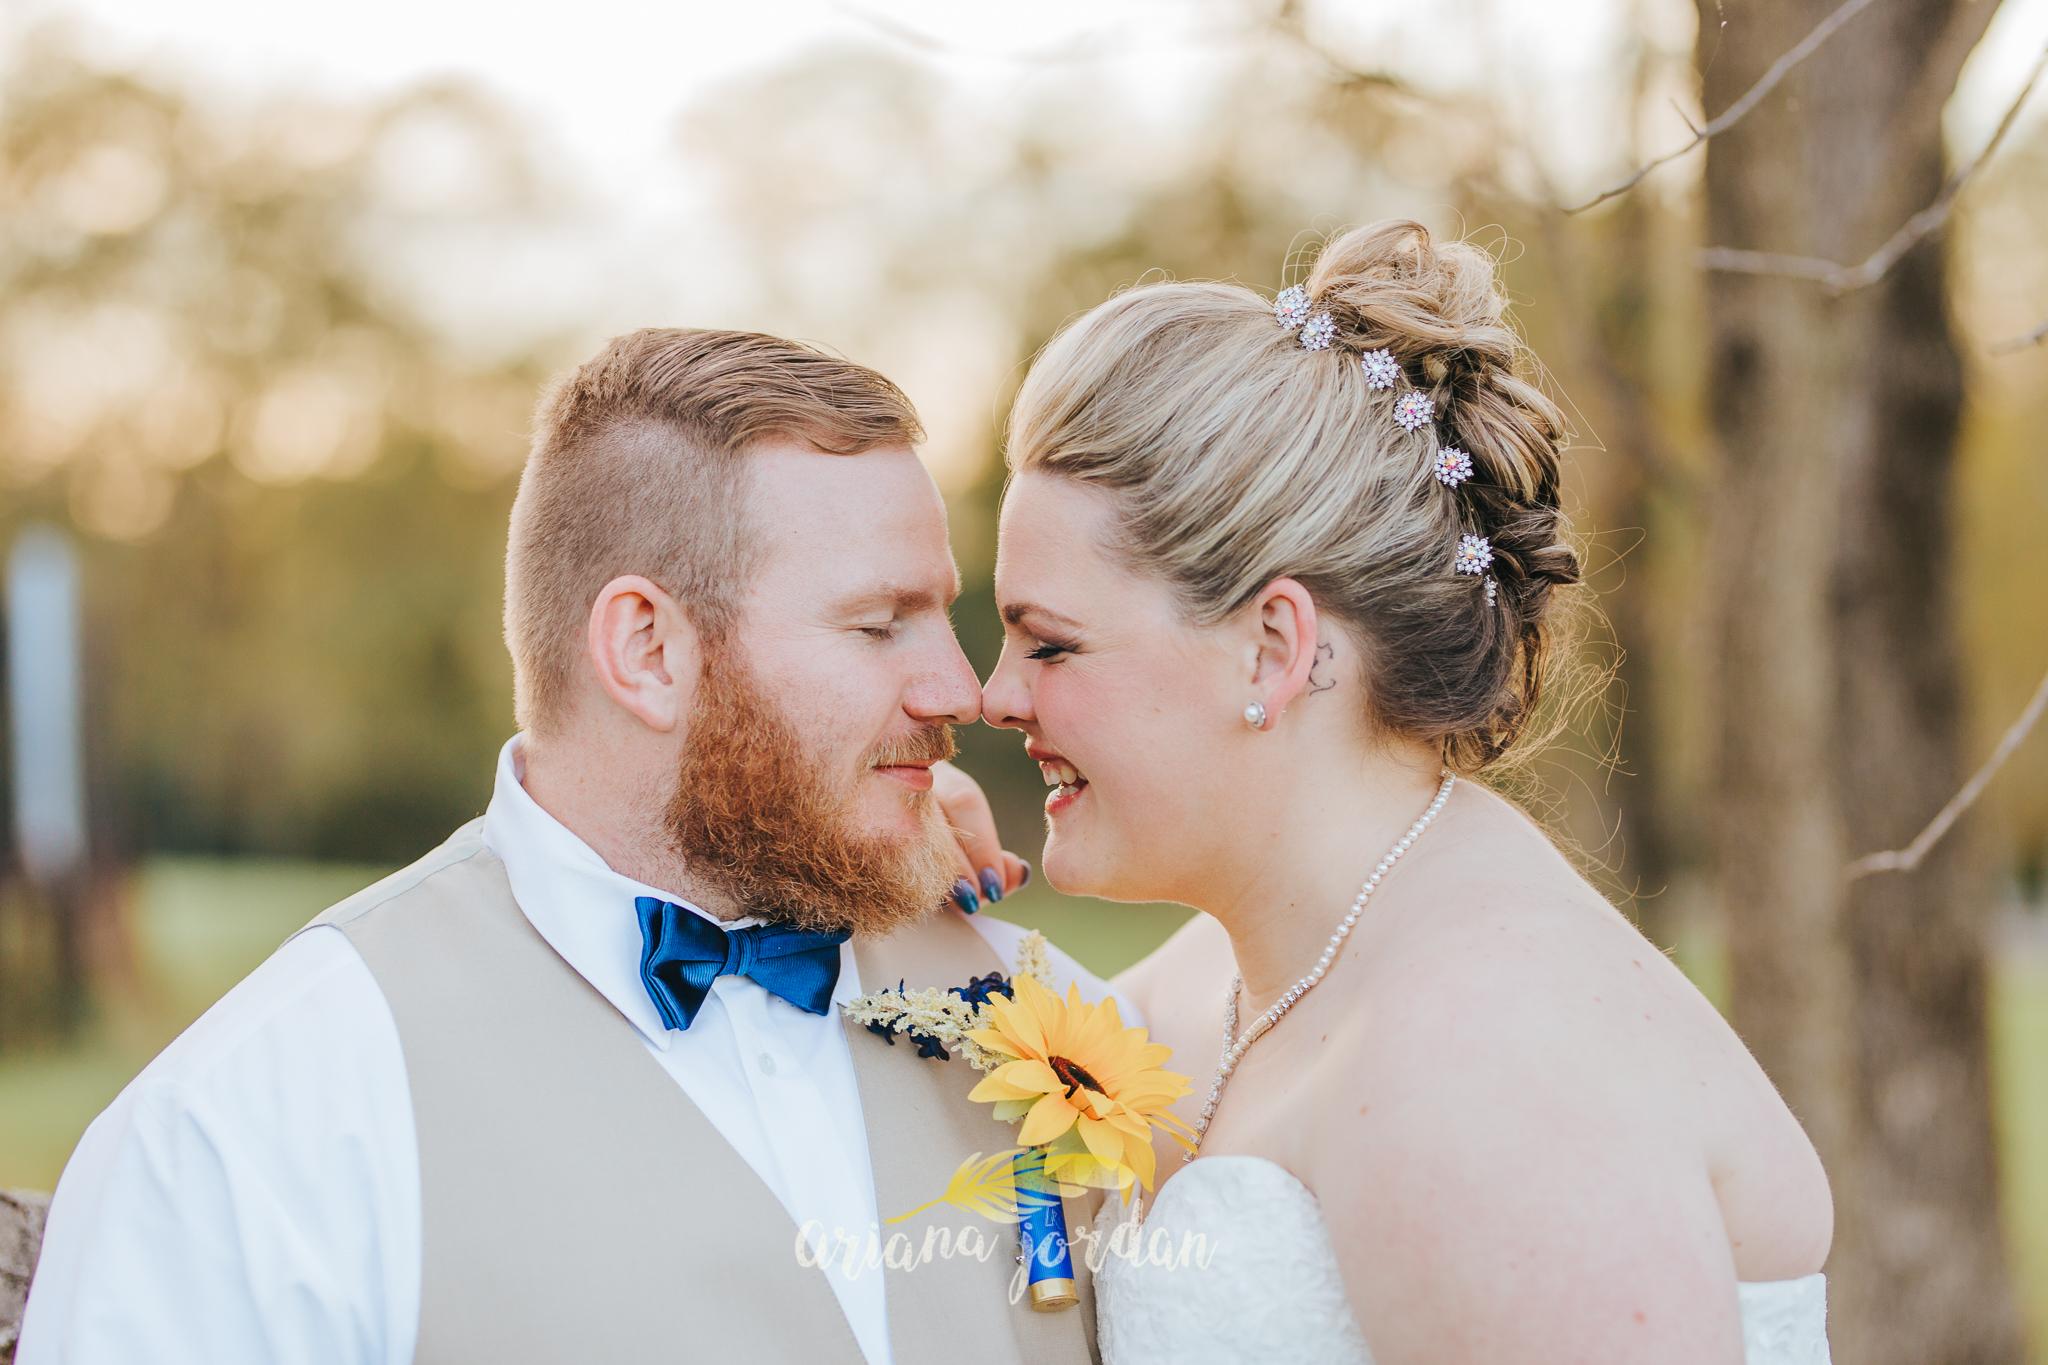 0092 Ariana Jordan Photography - Georgetown KY Wedding Photographer 6986.jpg